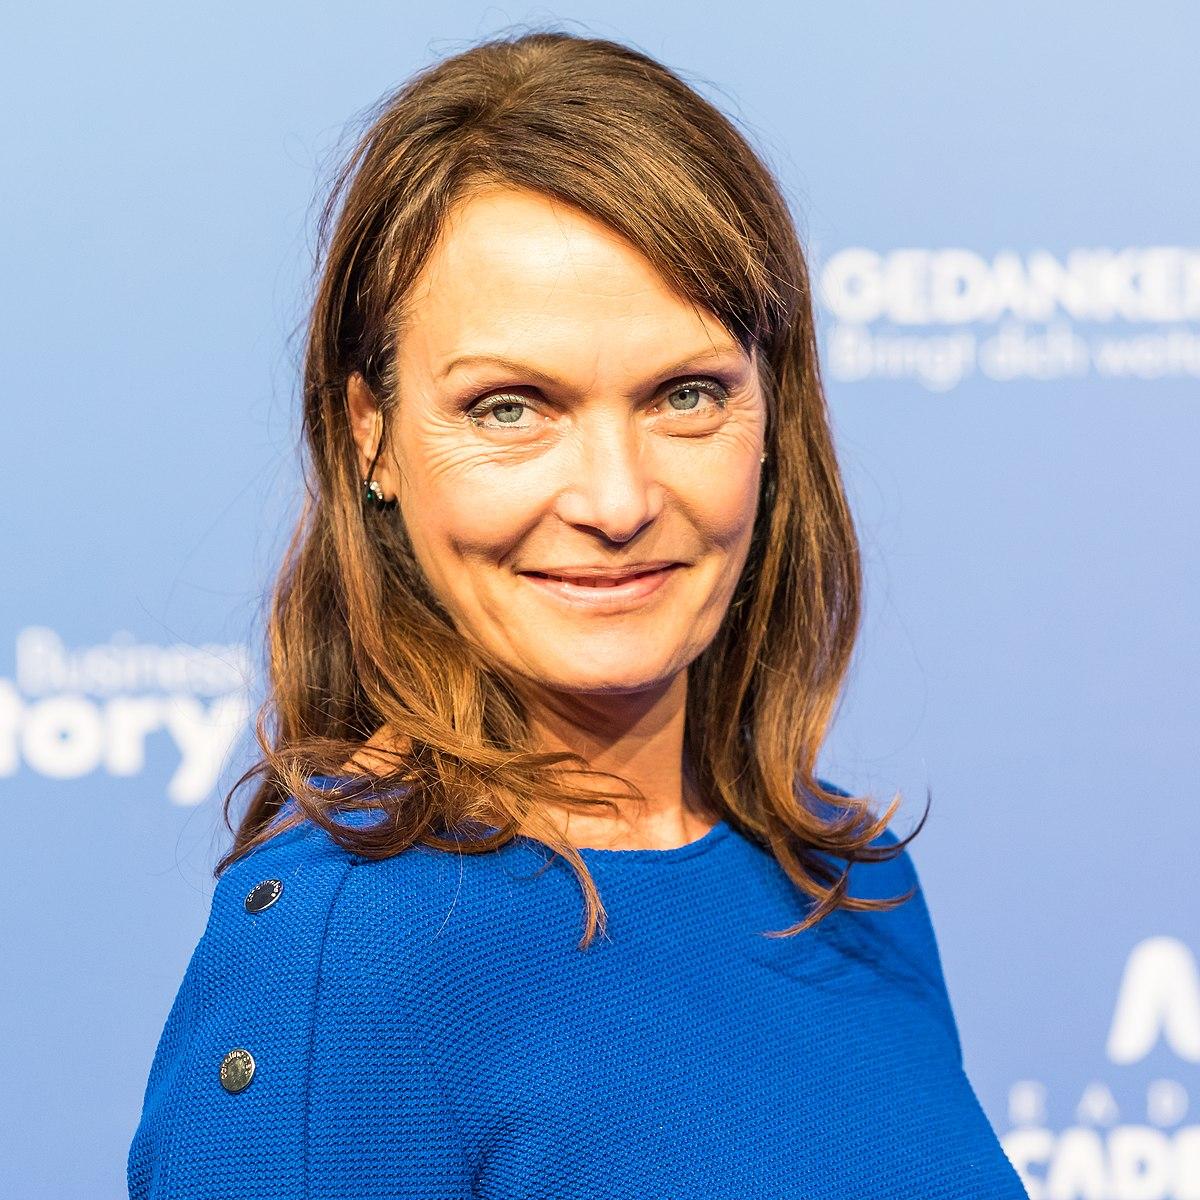 Simone Standl